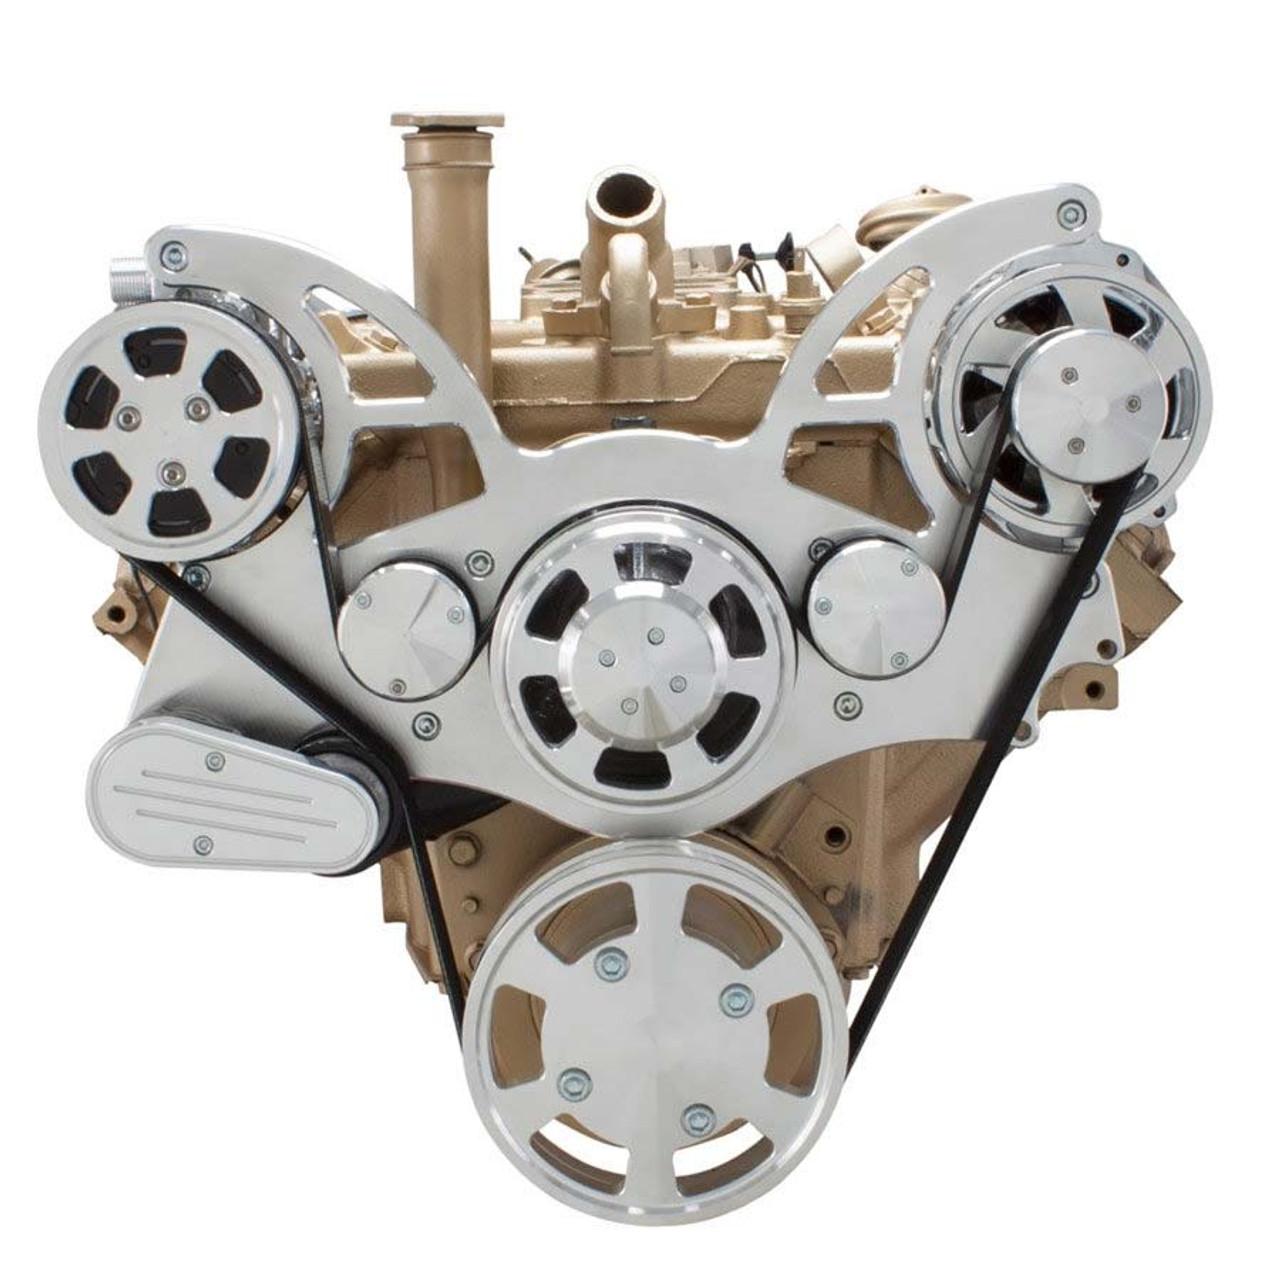 Serpentine Conversion Kit For Oldsmobile 350 455 With Ac Alternator. Serpentine System For Oldsmobile 350455 Ac Alternator. Wiring. 455 Olds Engine Belt Diagram At Scoala.co